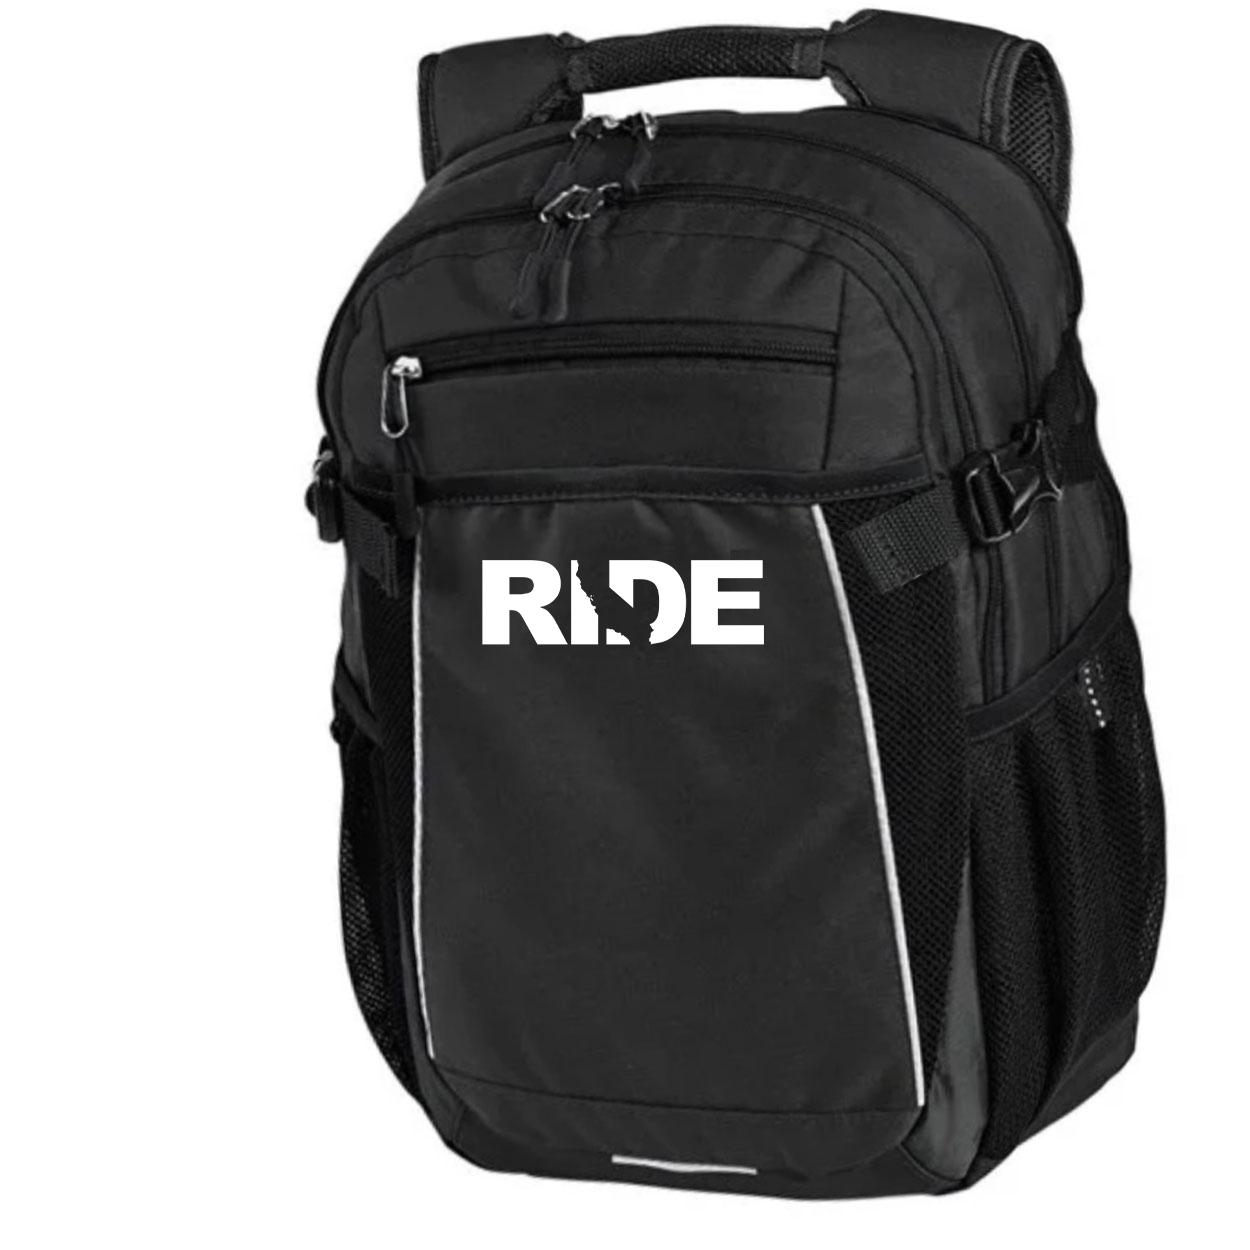 Ride California Classic Pro Pioneer Backpack Black (White Logo)